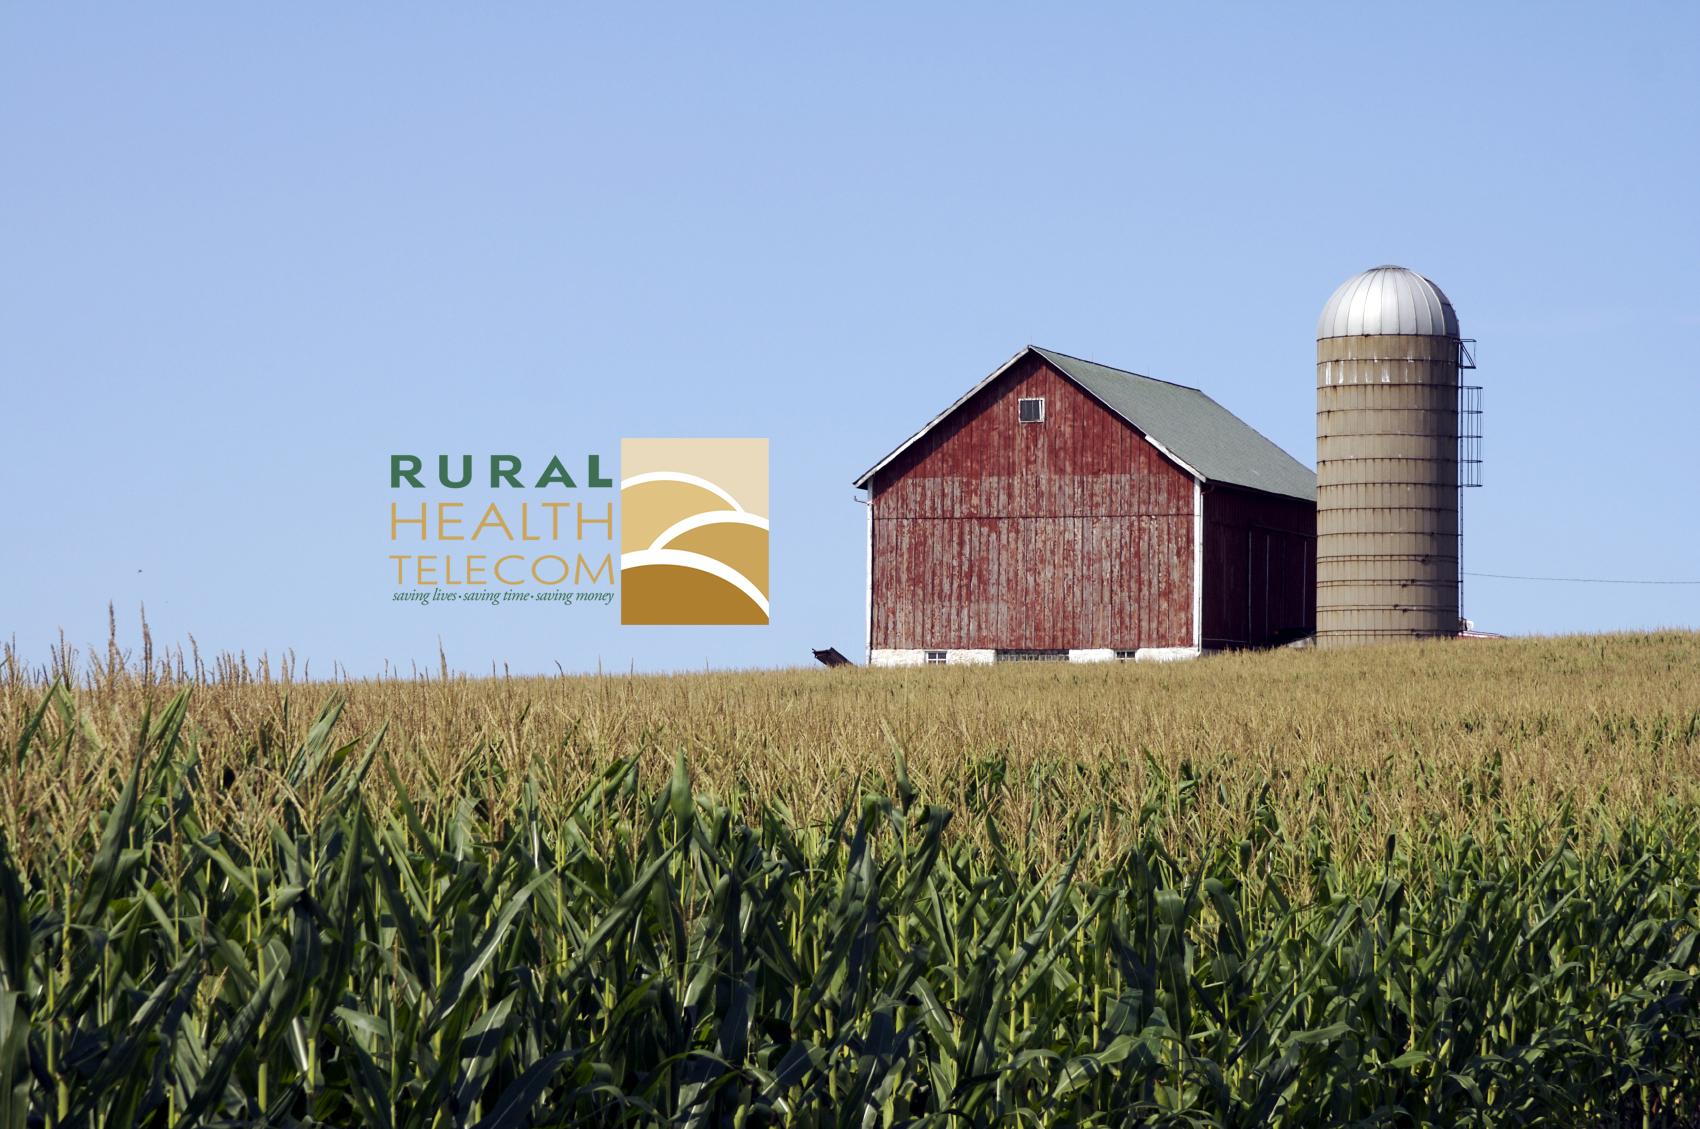 Rural Health Telecom℠